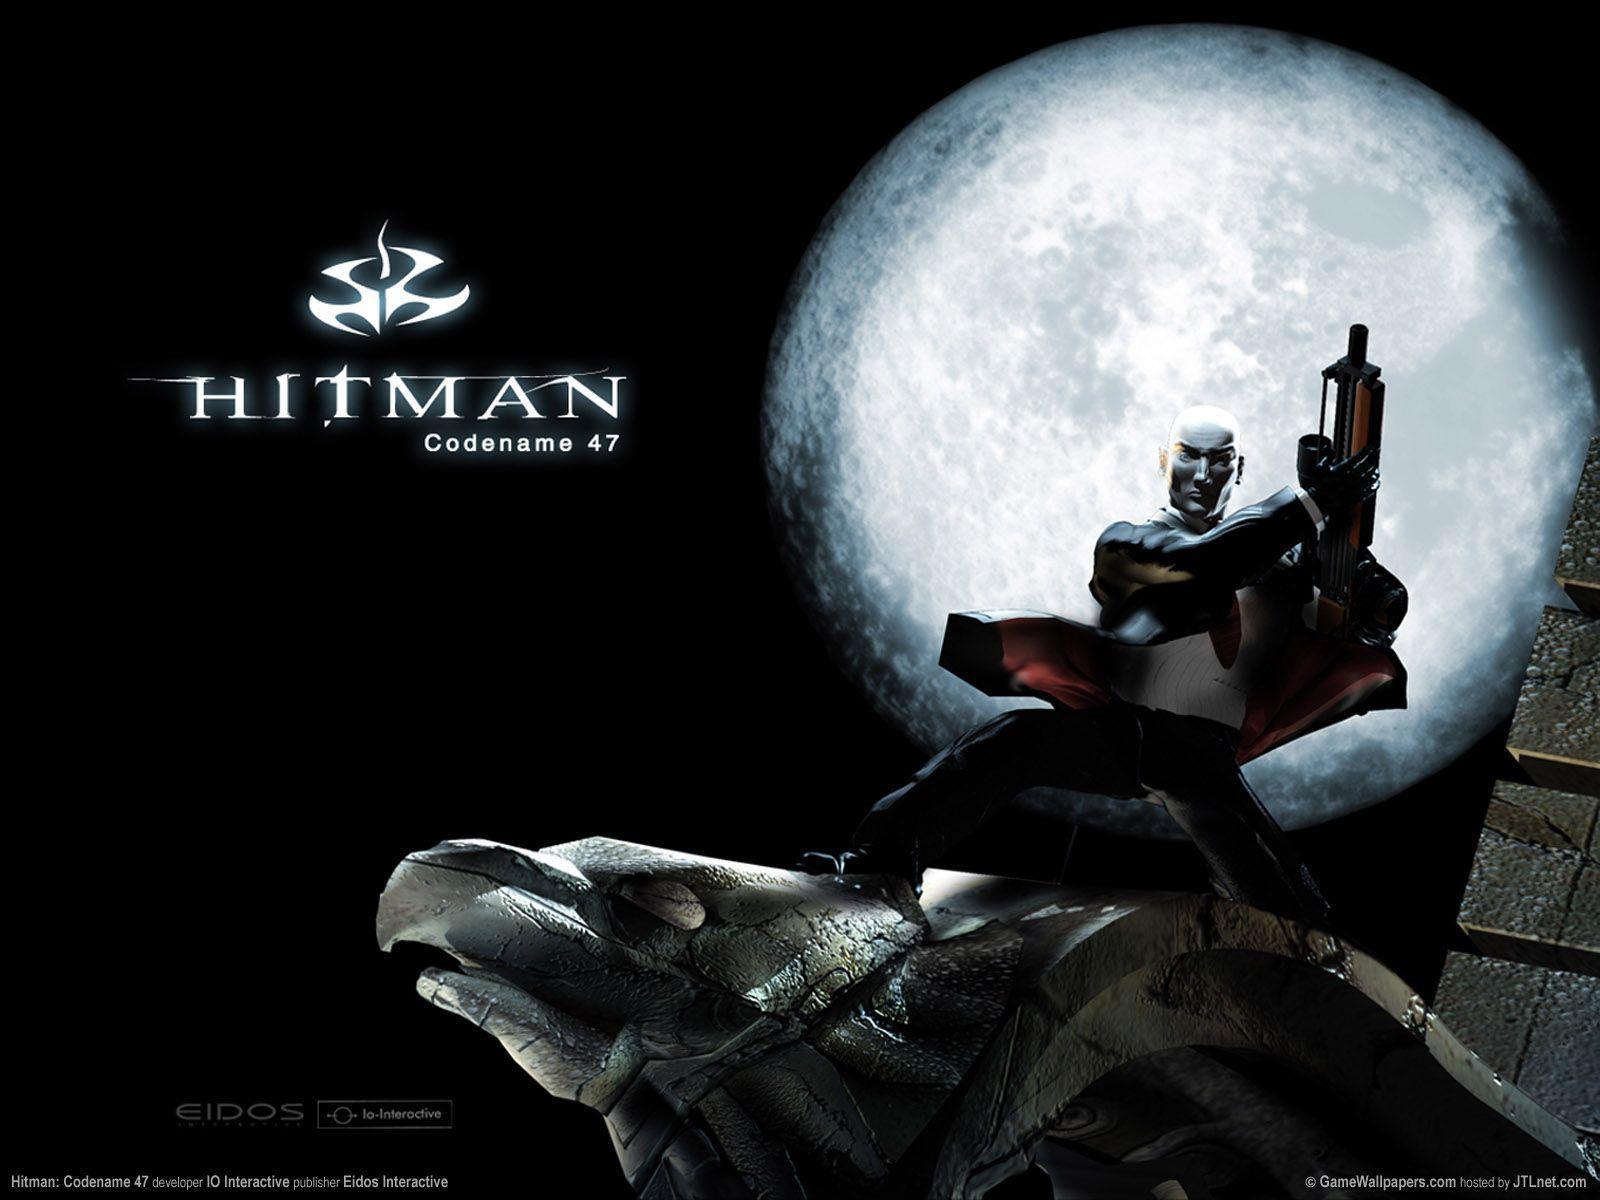 Hitman Agent 47 Wallpapers - Top Free Hitman Agent 47